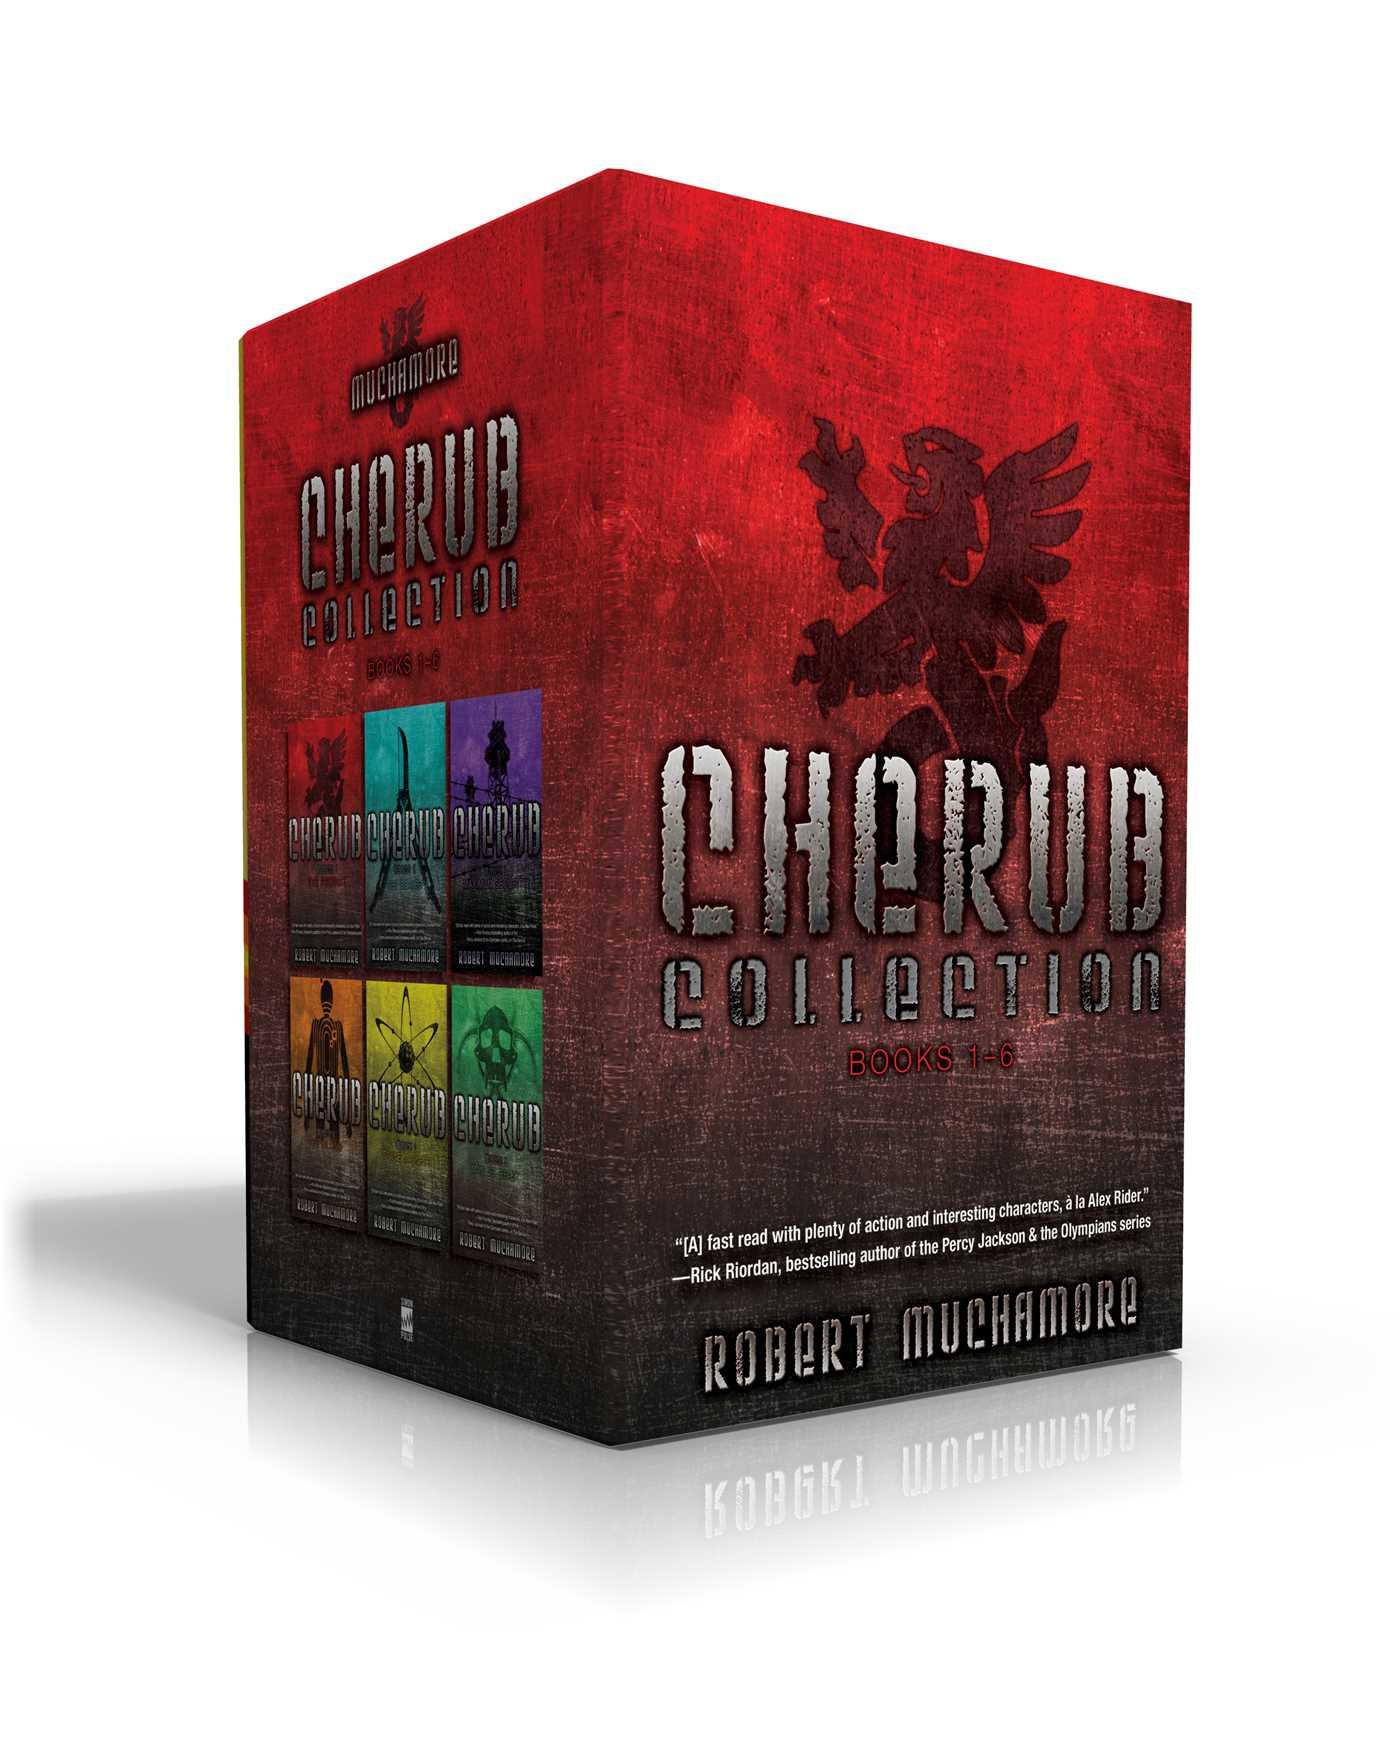 cherub collection books 1 u20136